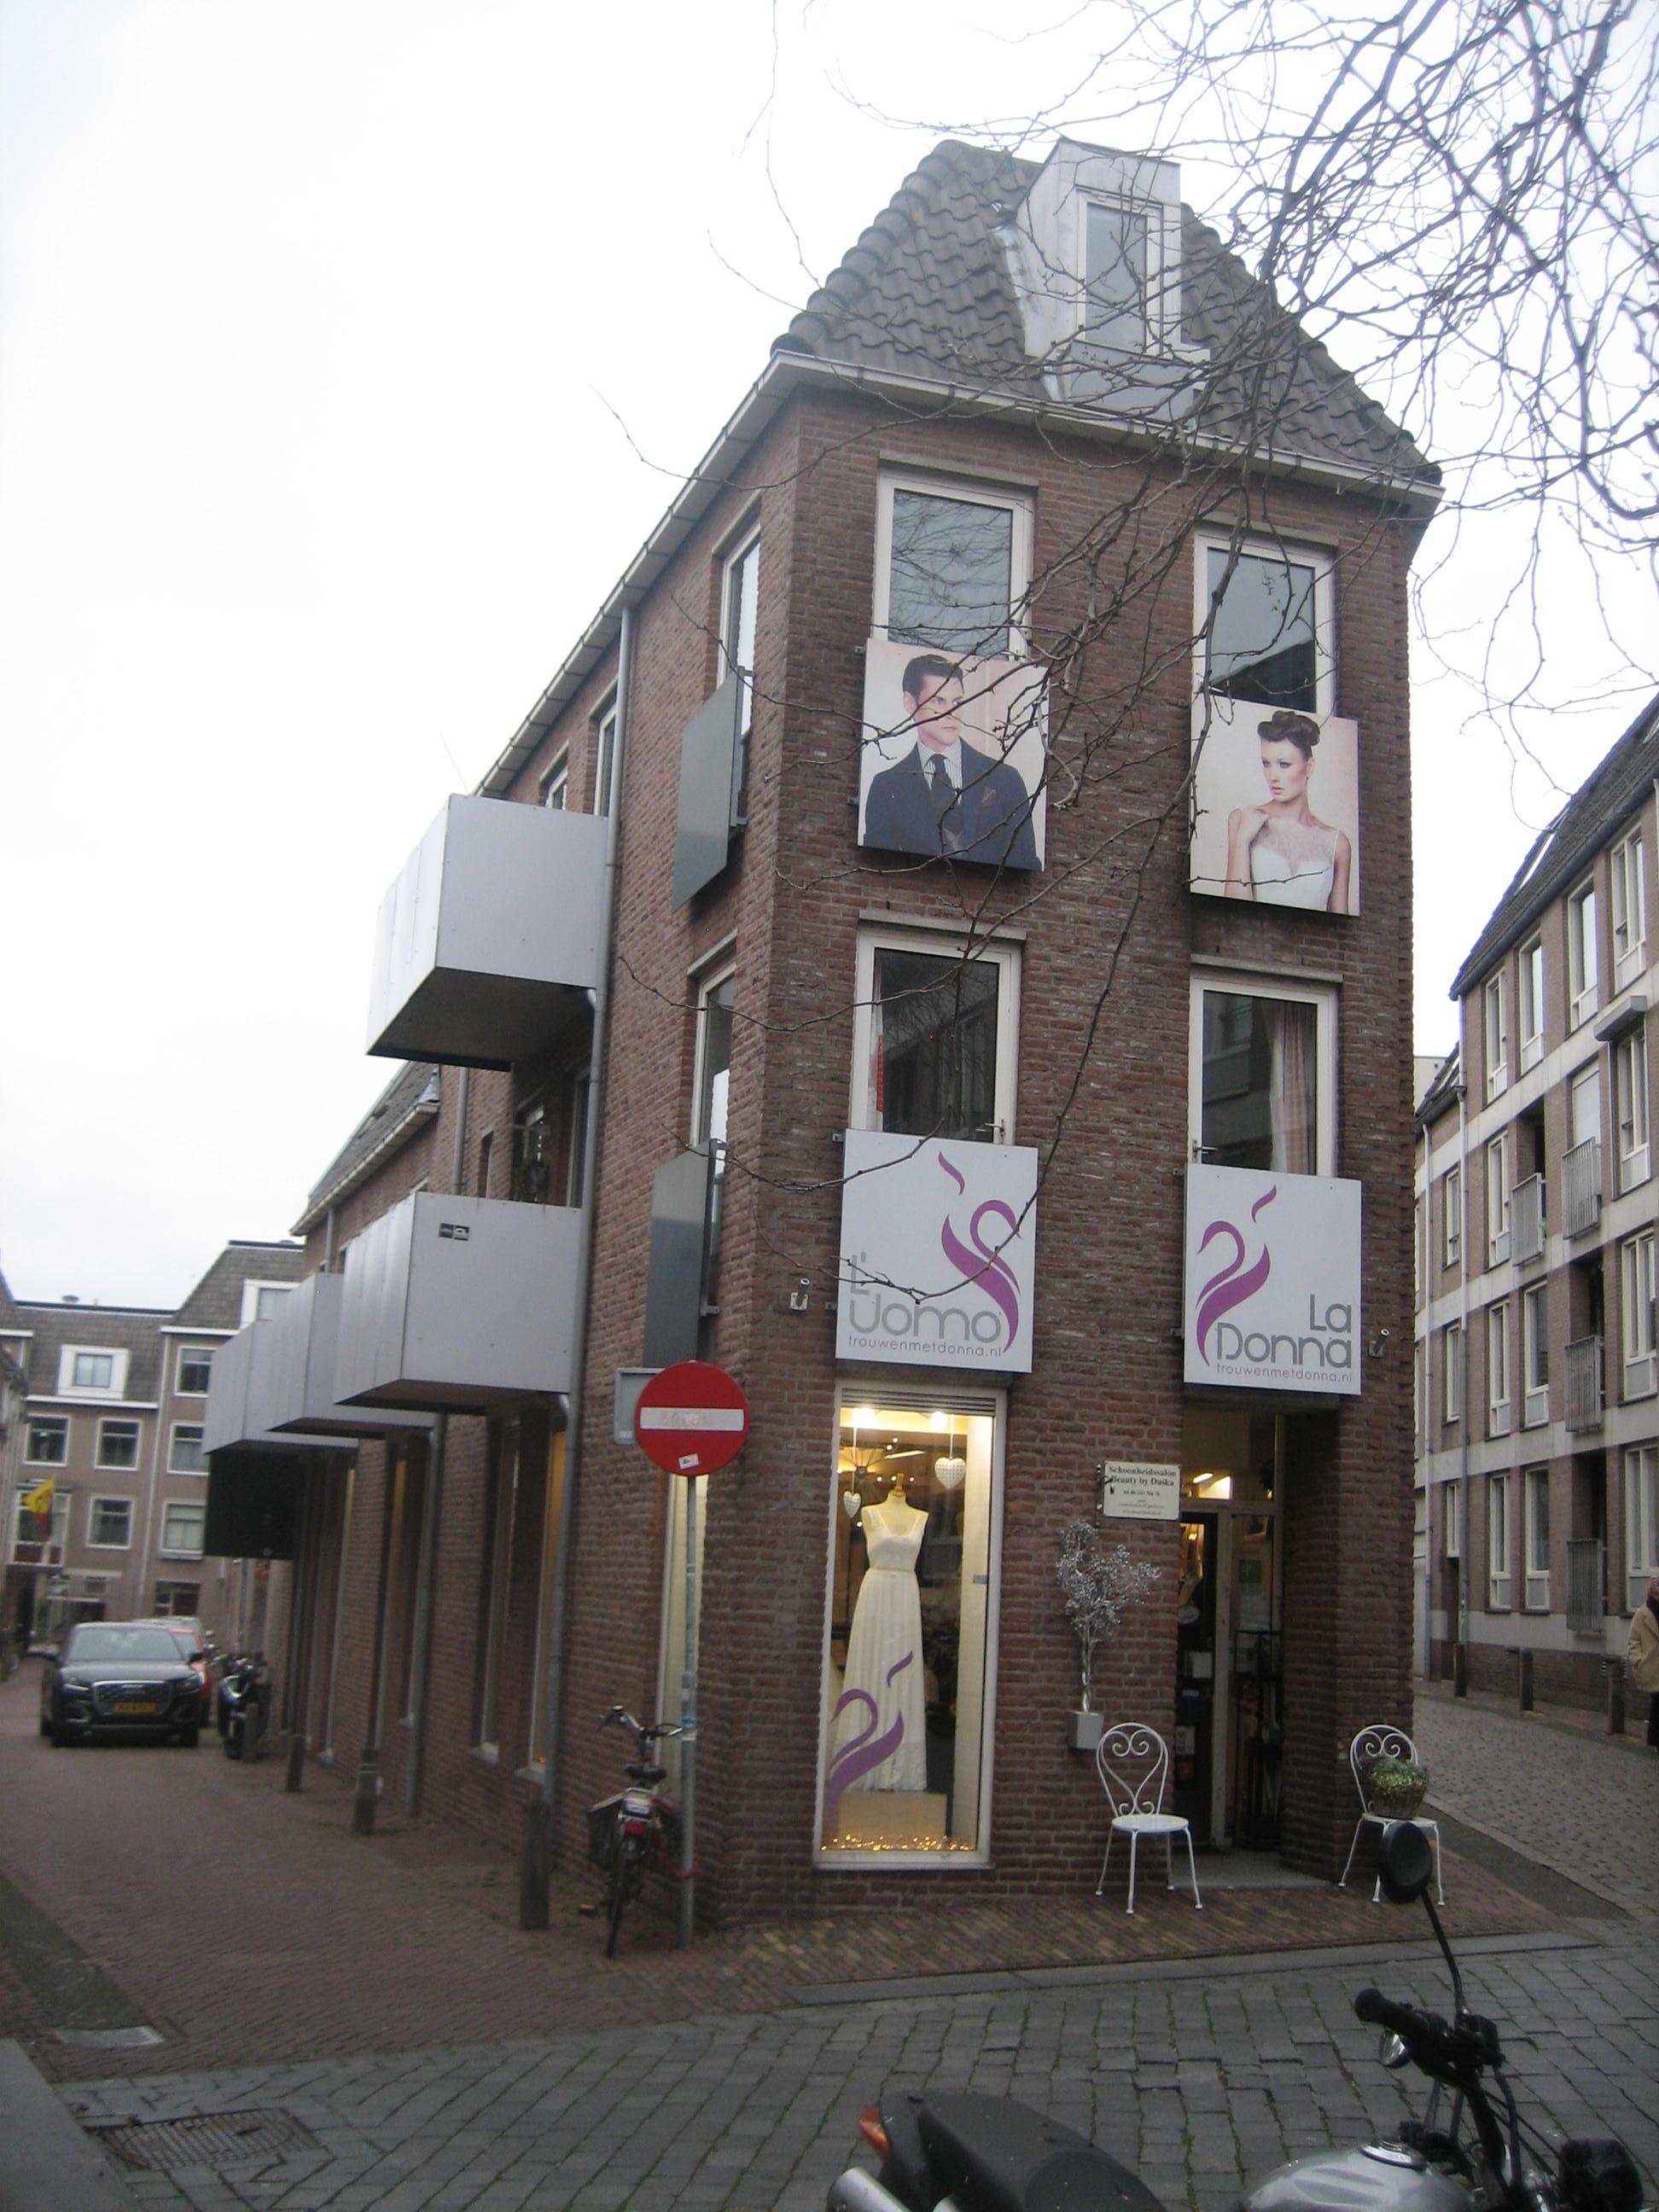 Galerie Marzee, Ganzenheuvel. Foto Esther Doornbusch, 2 maart 2019, CC BY 4.0